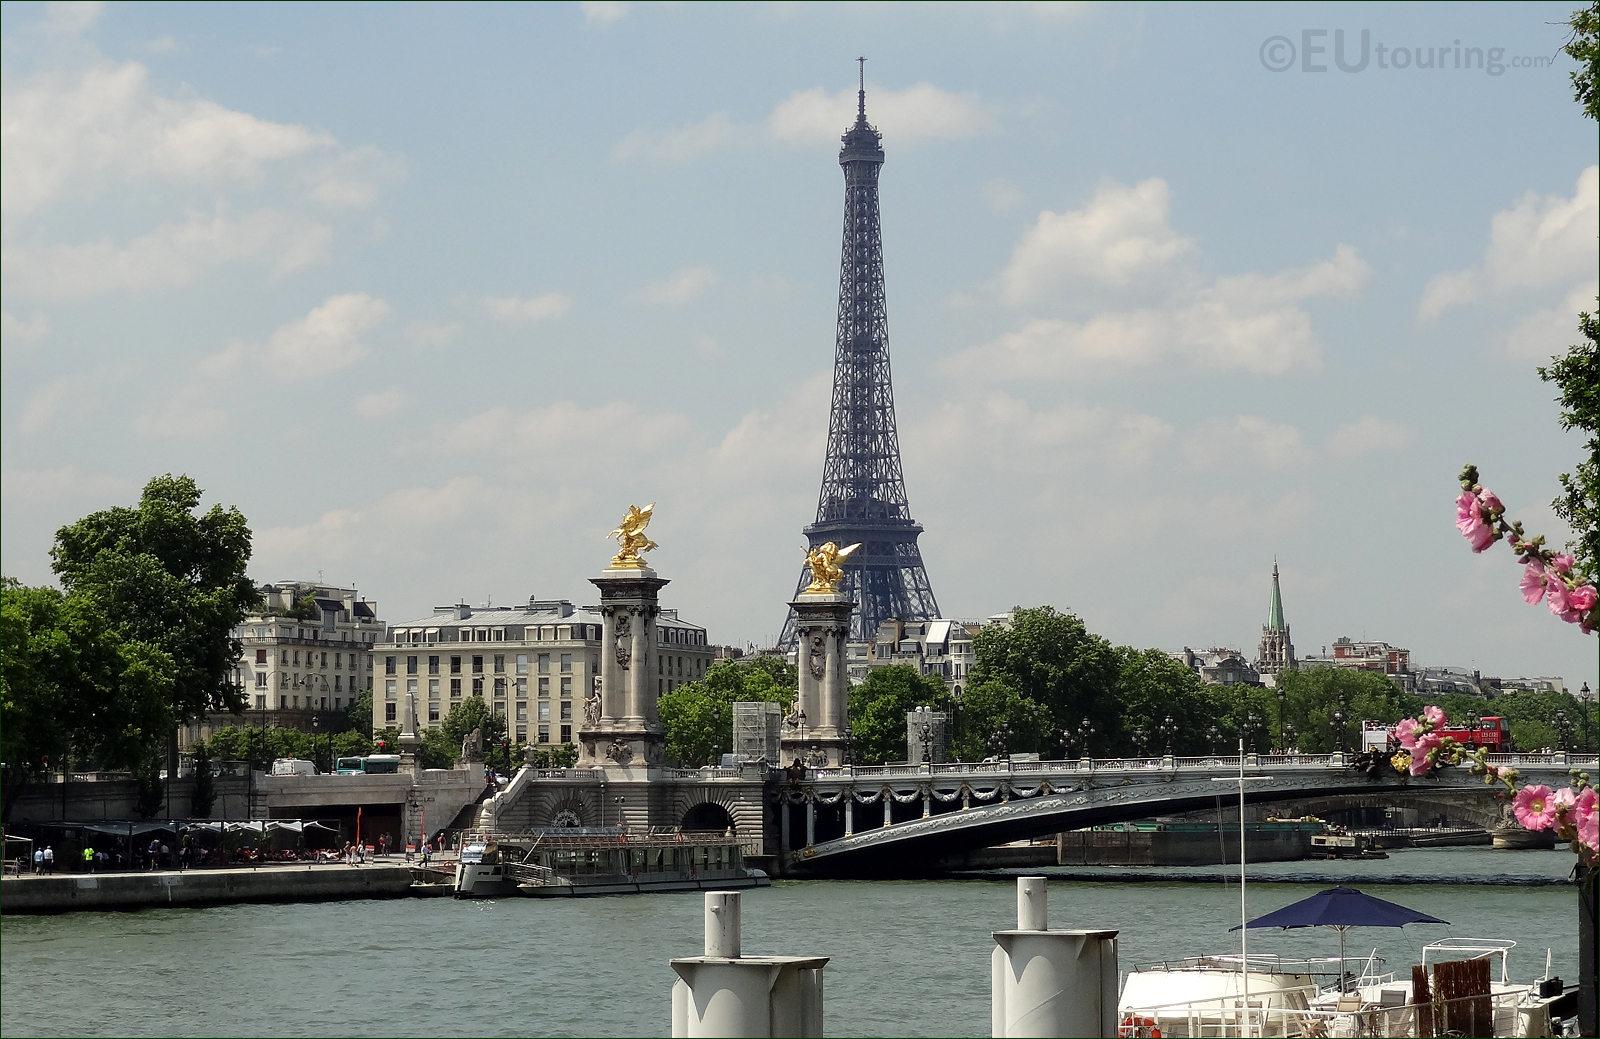 HD Photos Of Pont Alexandre III Bridge In Paris